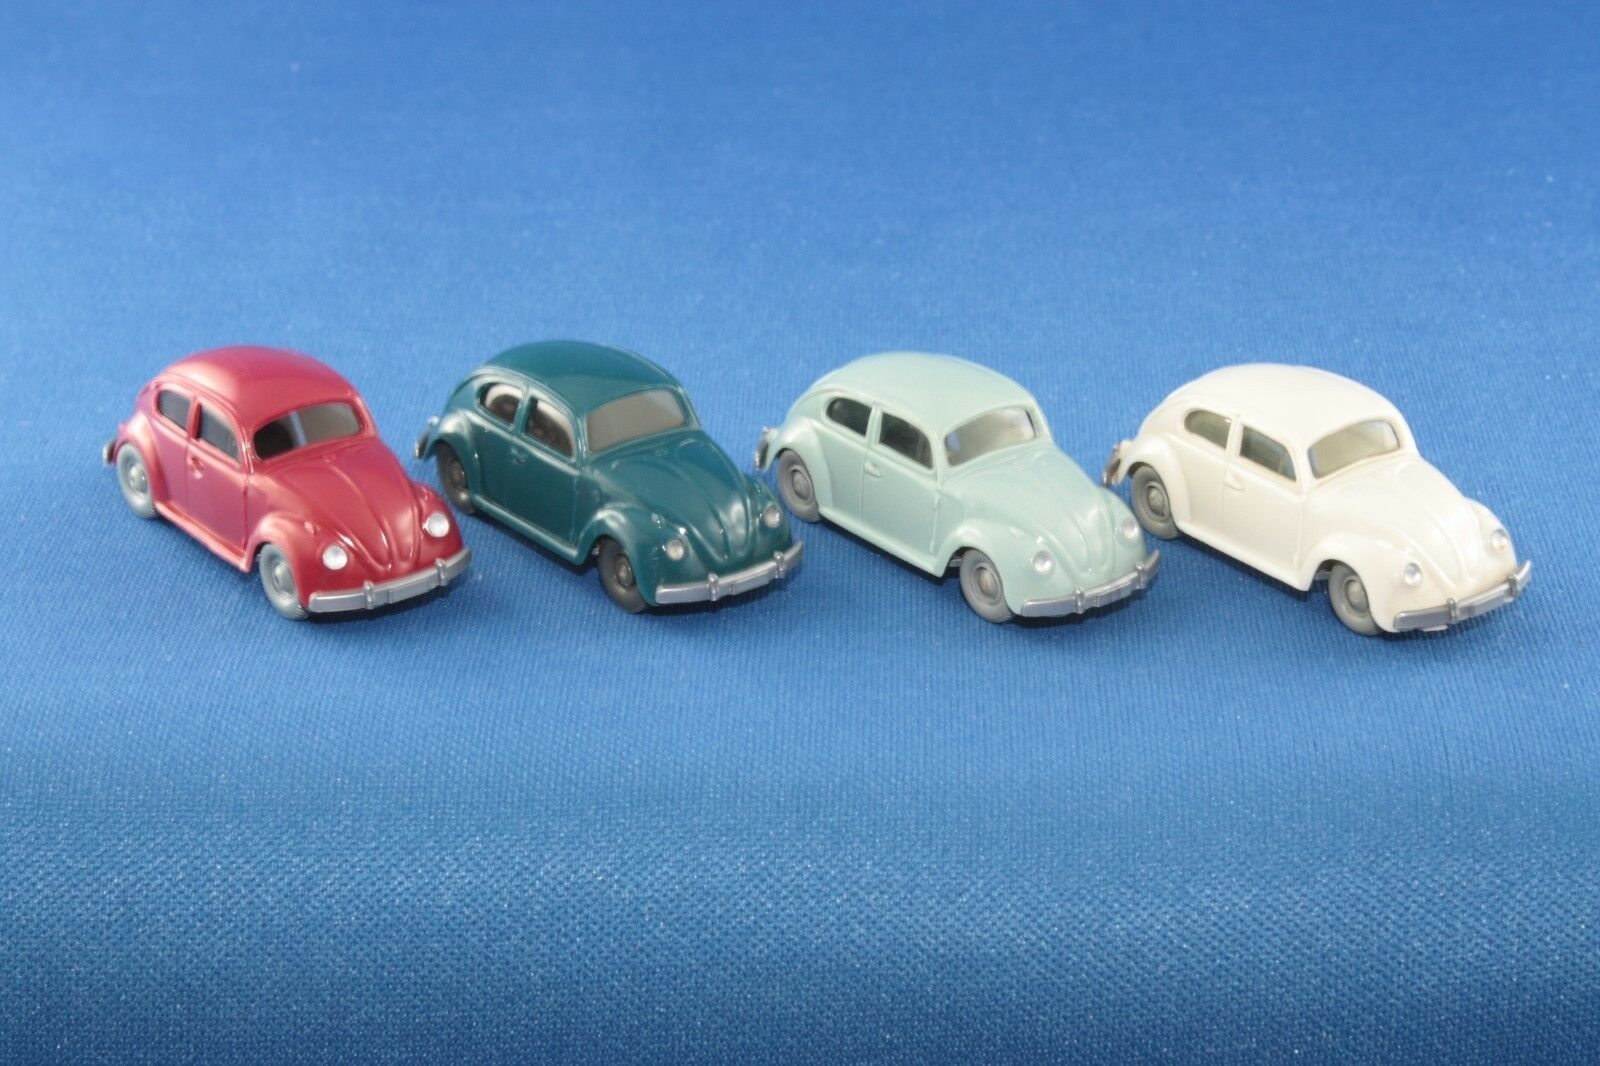 Wiking Volkswagen VW Beetle 1200 liasse 1 87 1 90 h0 O. neuf dans sa boîte COLLECTION résolution